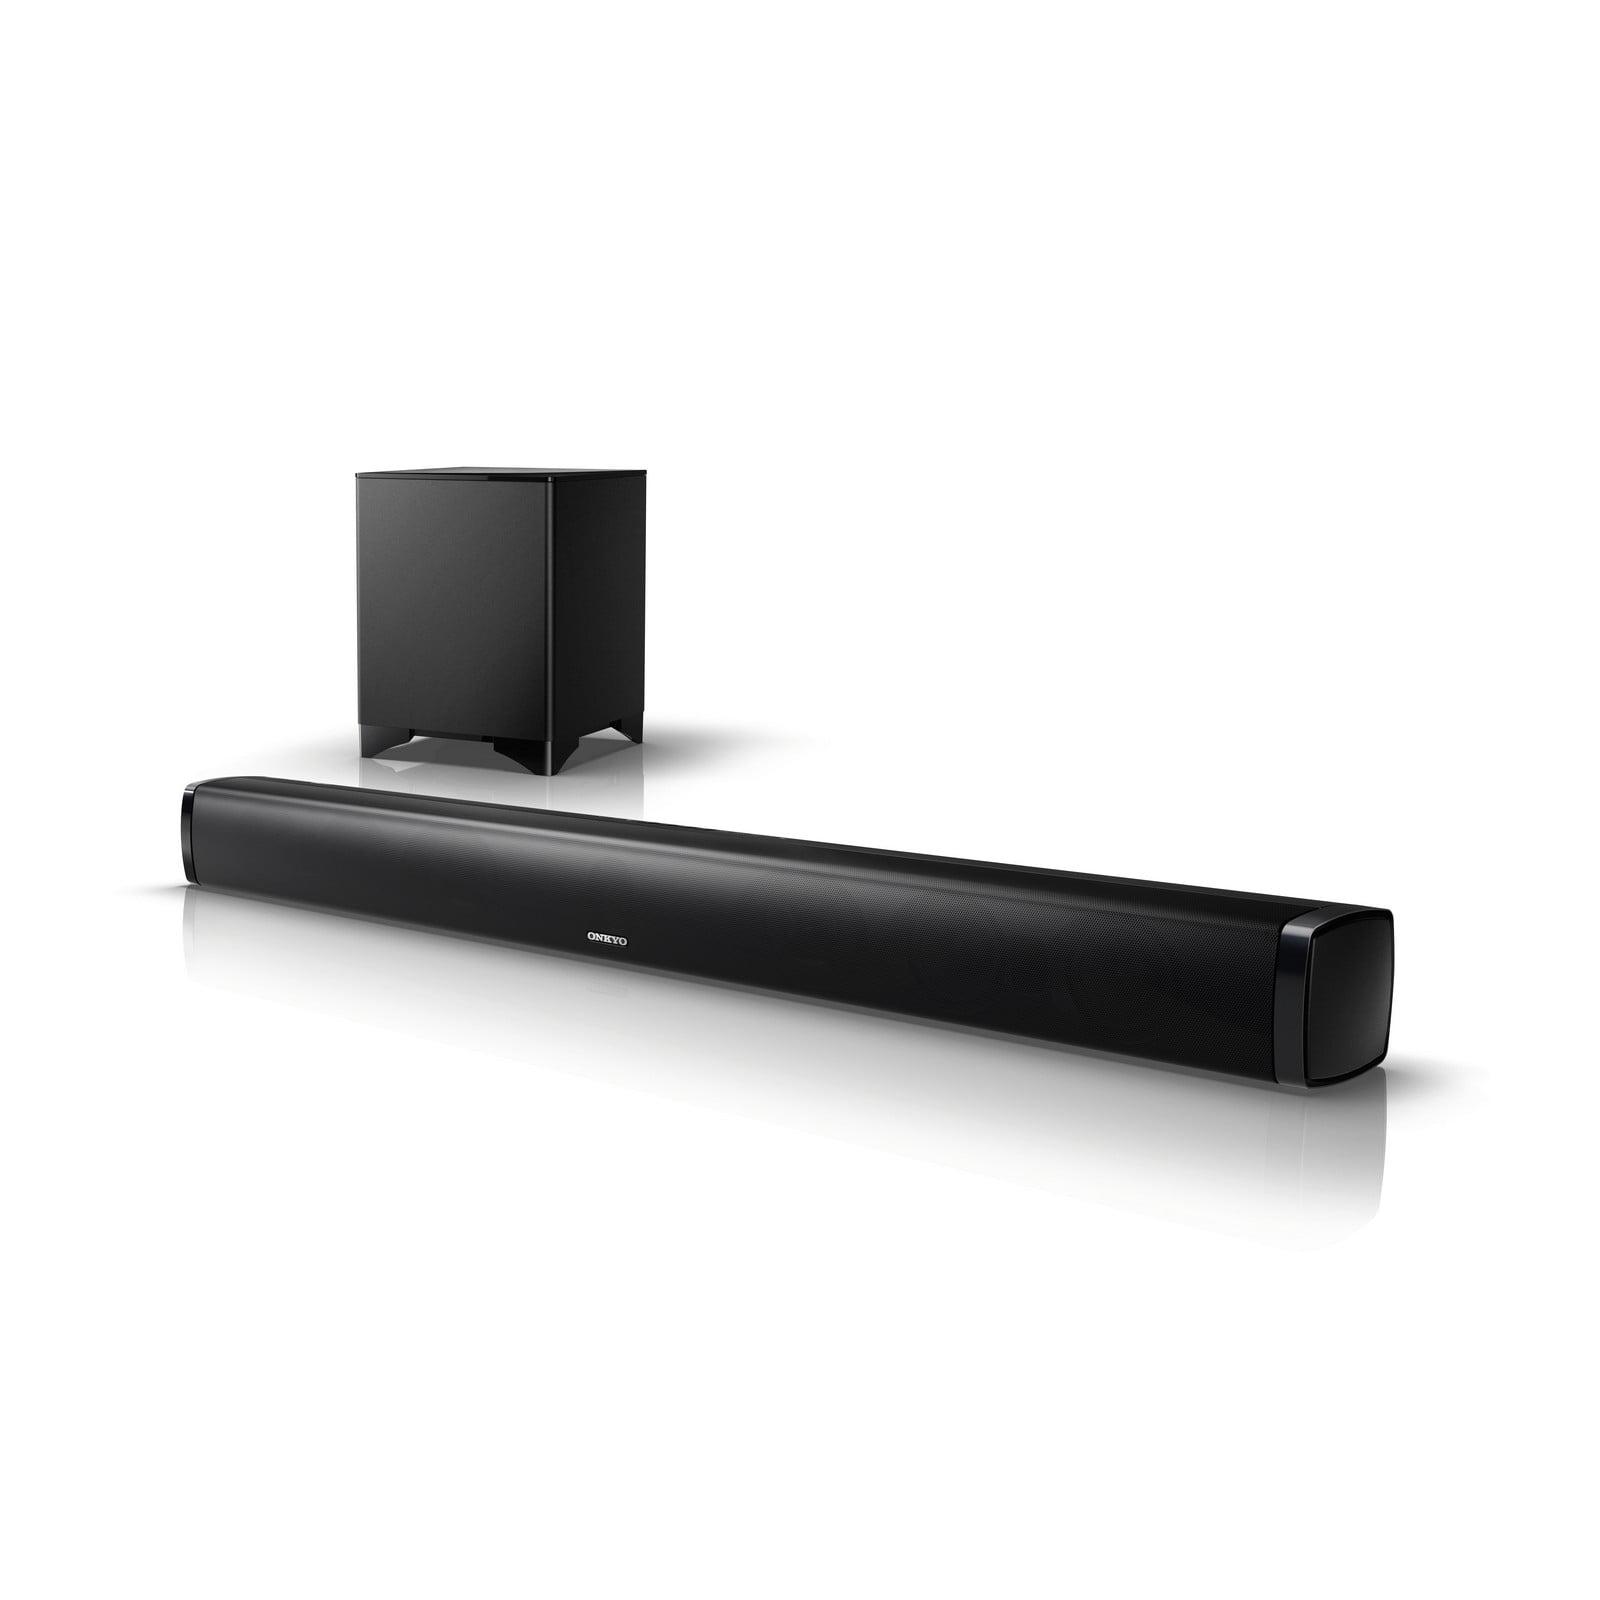 Onkyo LS-B50 | Envision Cinema Soundbar System by Onkyo